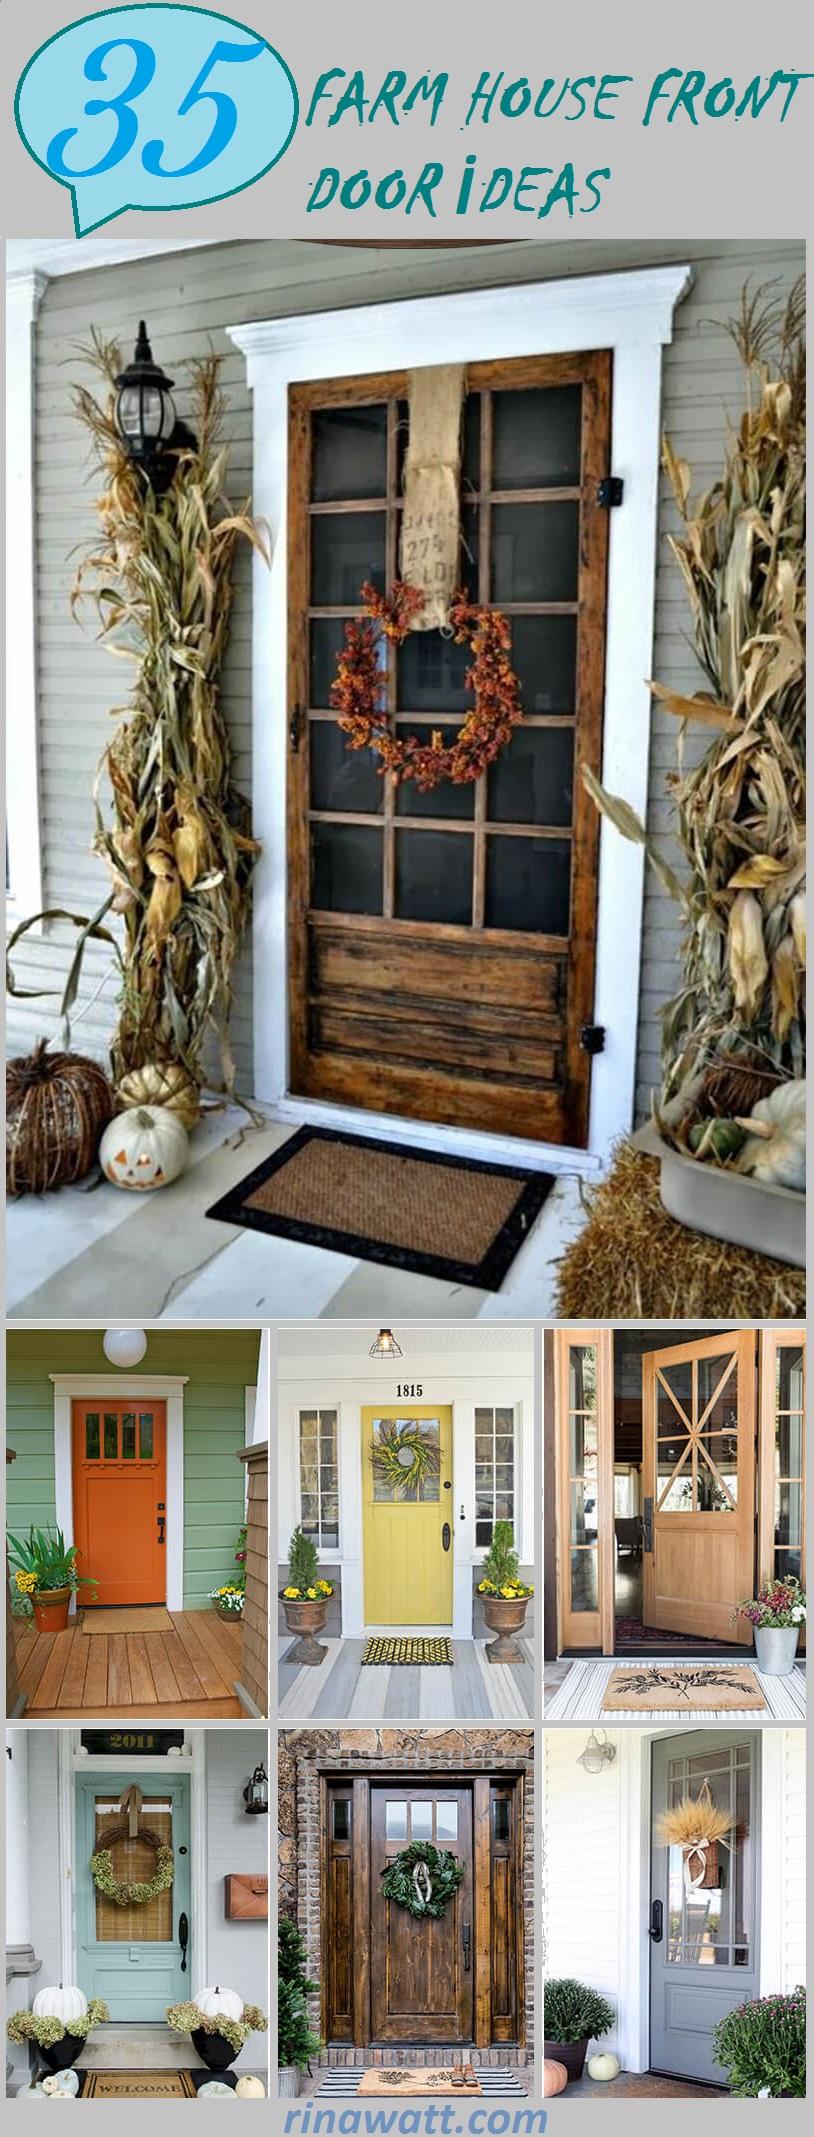 37 Gorgeous Farmhouse Front Door Ideas